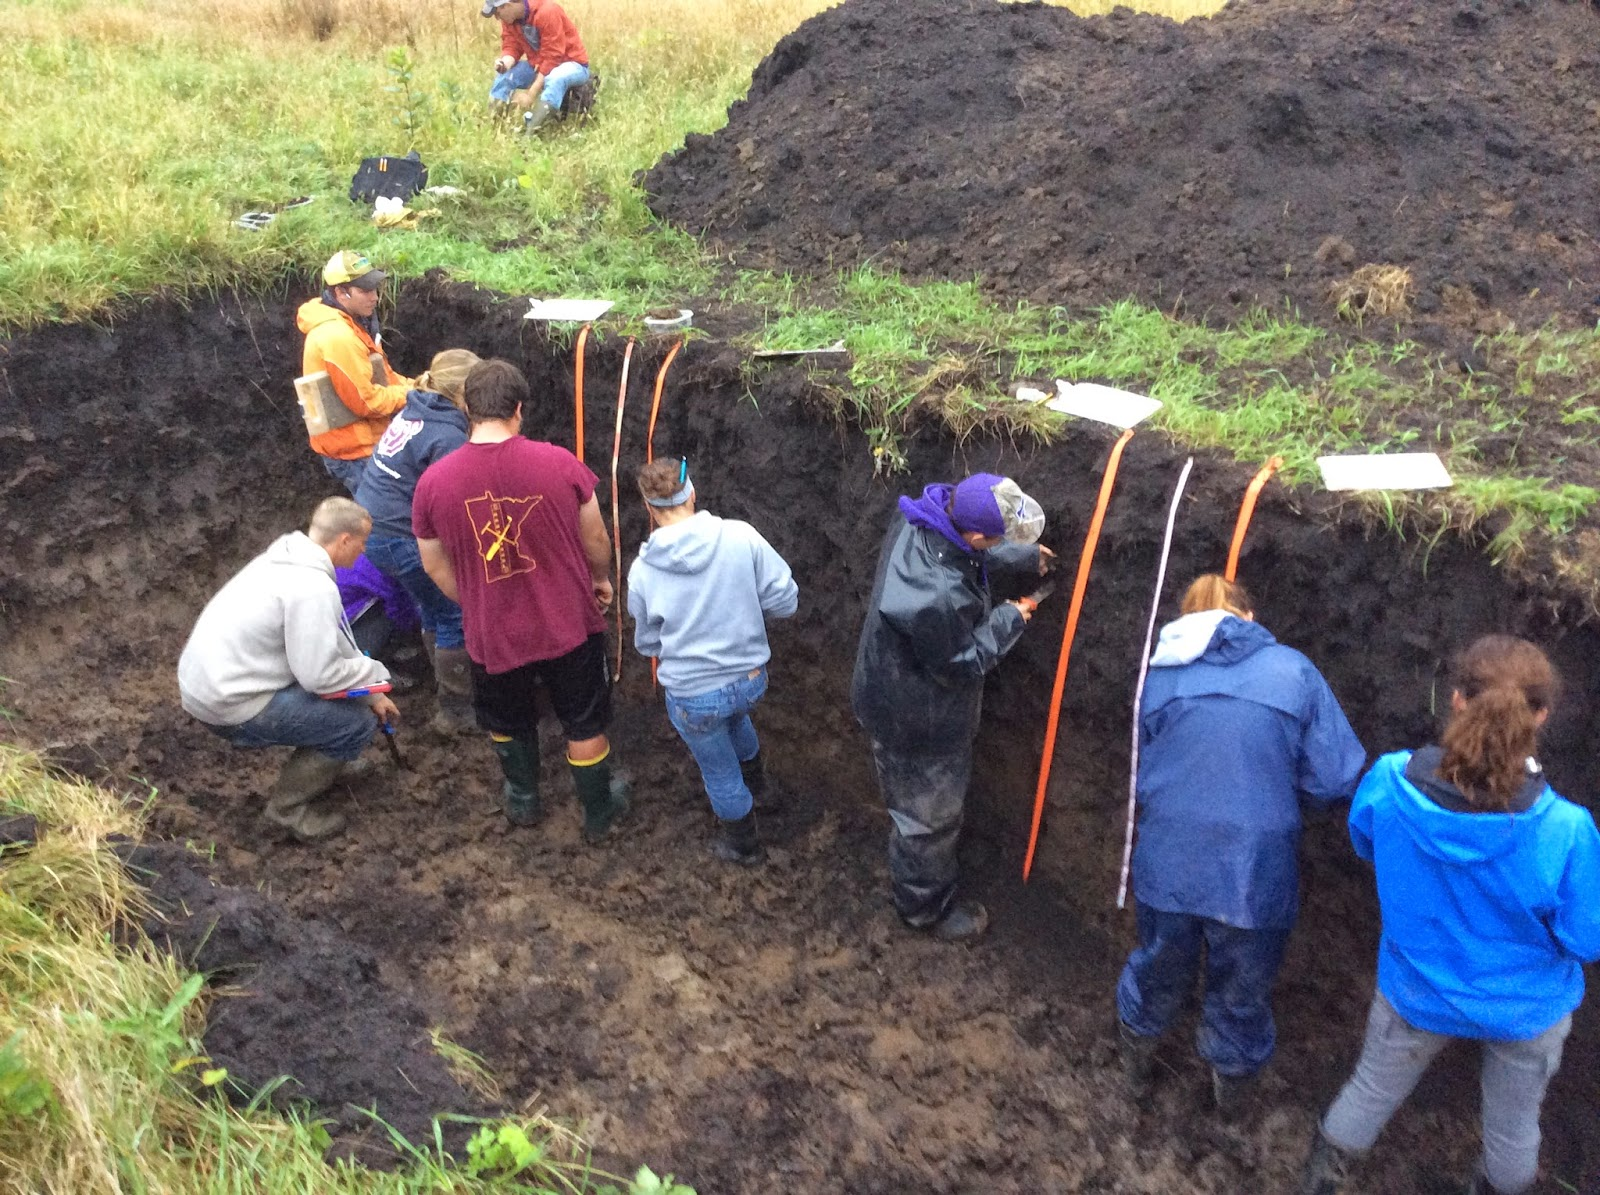 University of minnesota soil judging team october 2014 for Soil judging